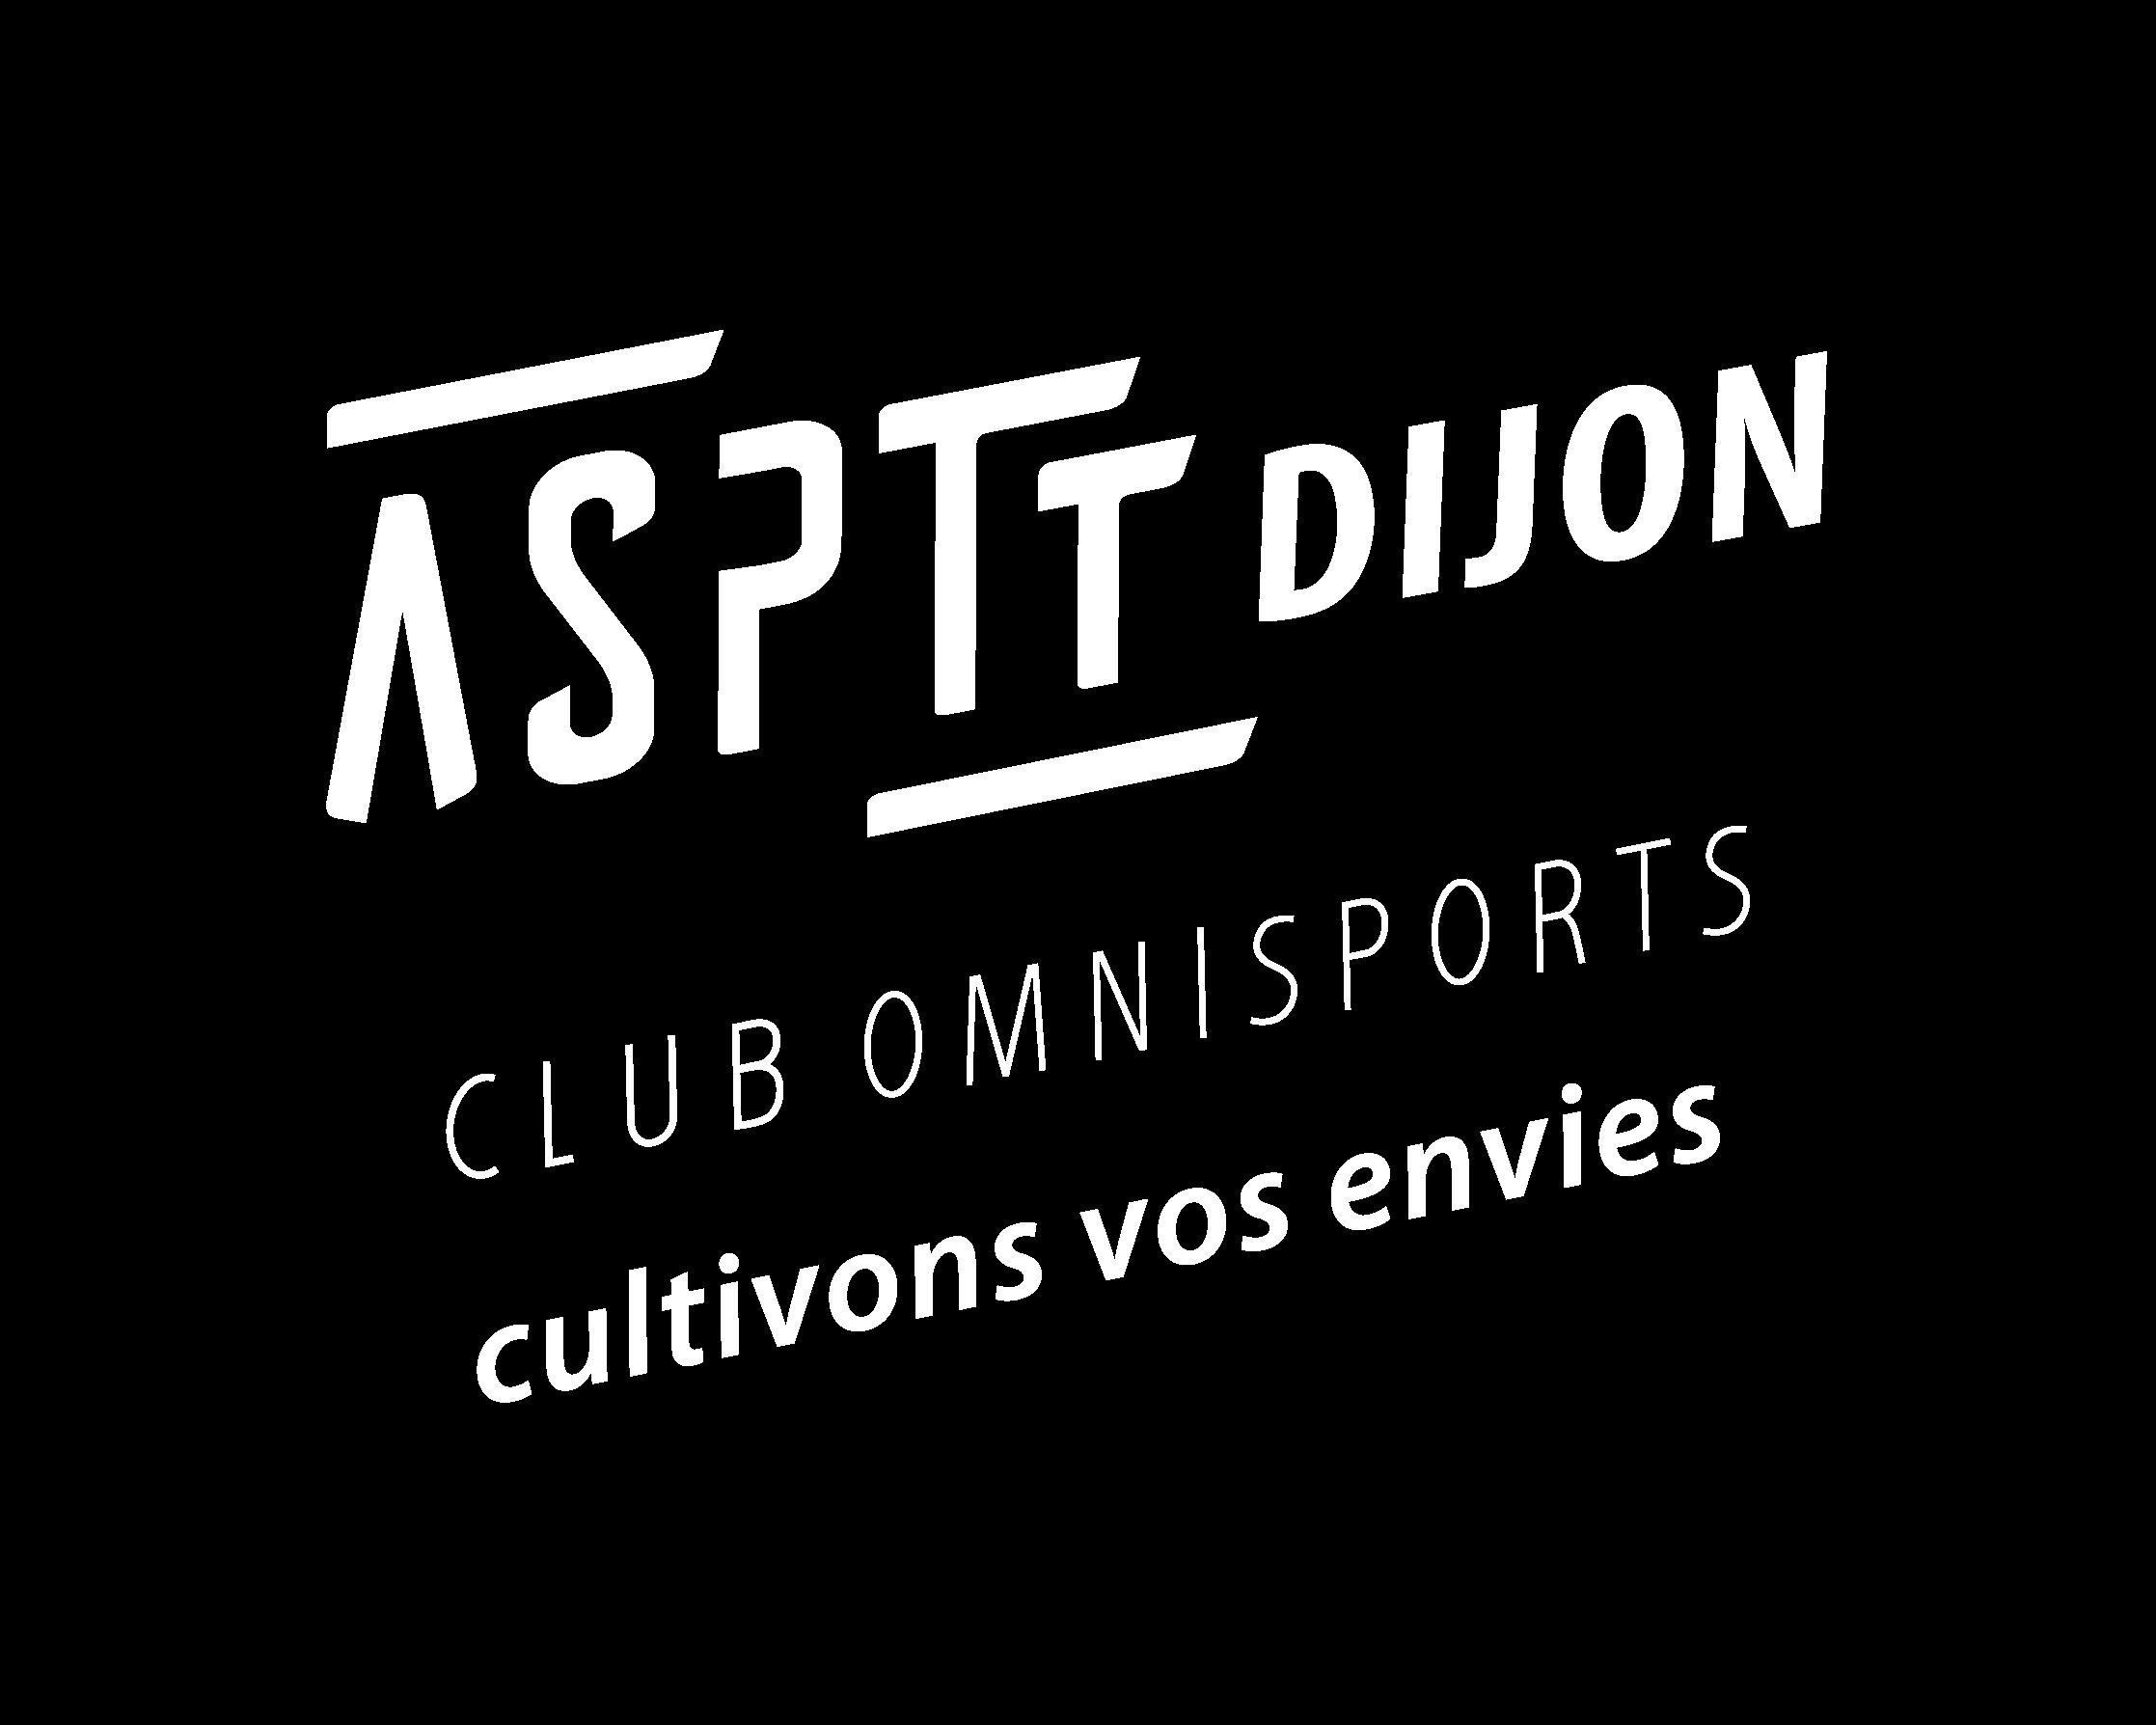 ASPTT Dijon